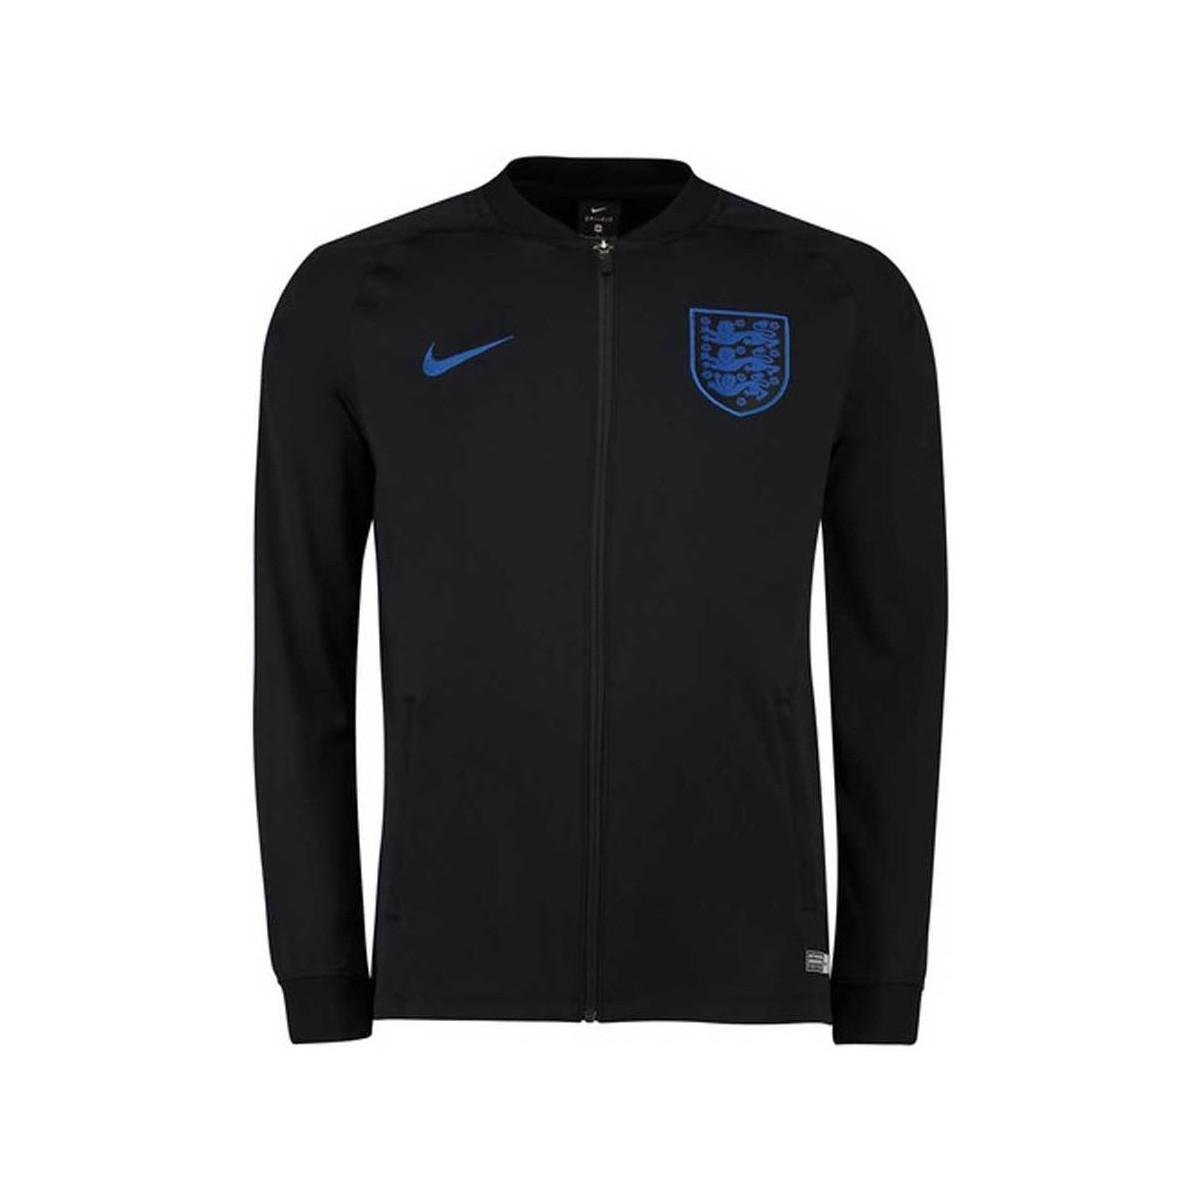 6523f88de6 Nike 2018-2019 England Squad Track Jacket Men s Fleece Jacket In ...